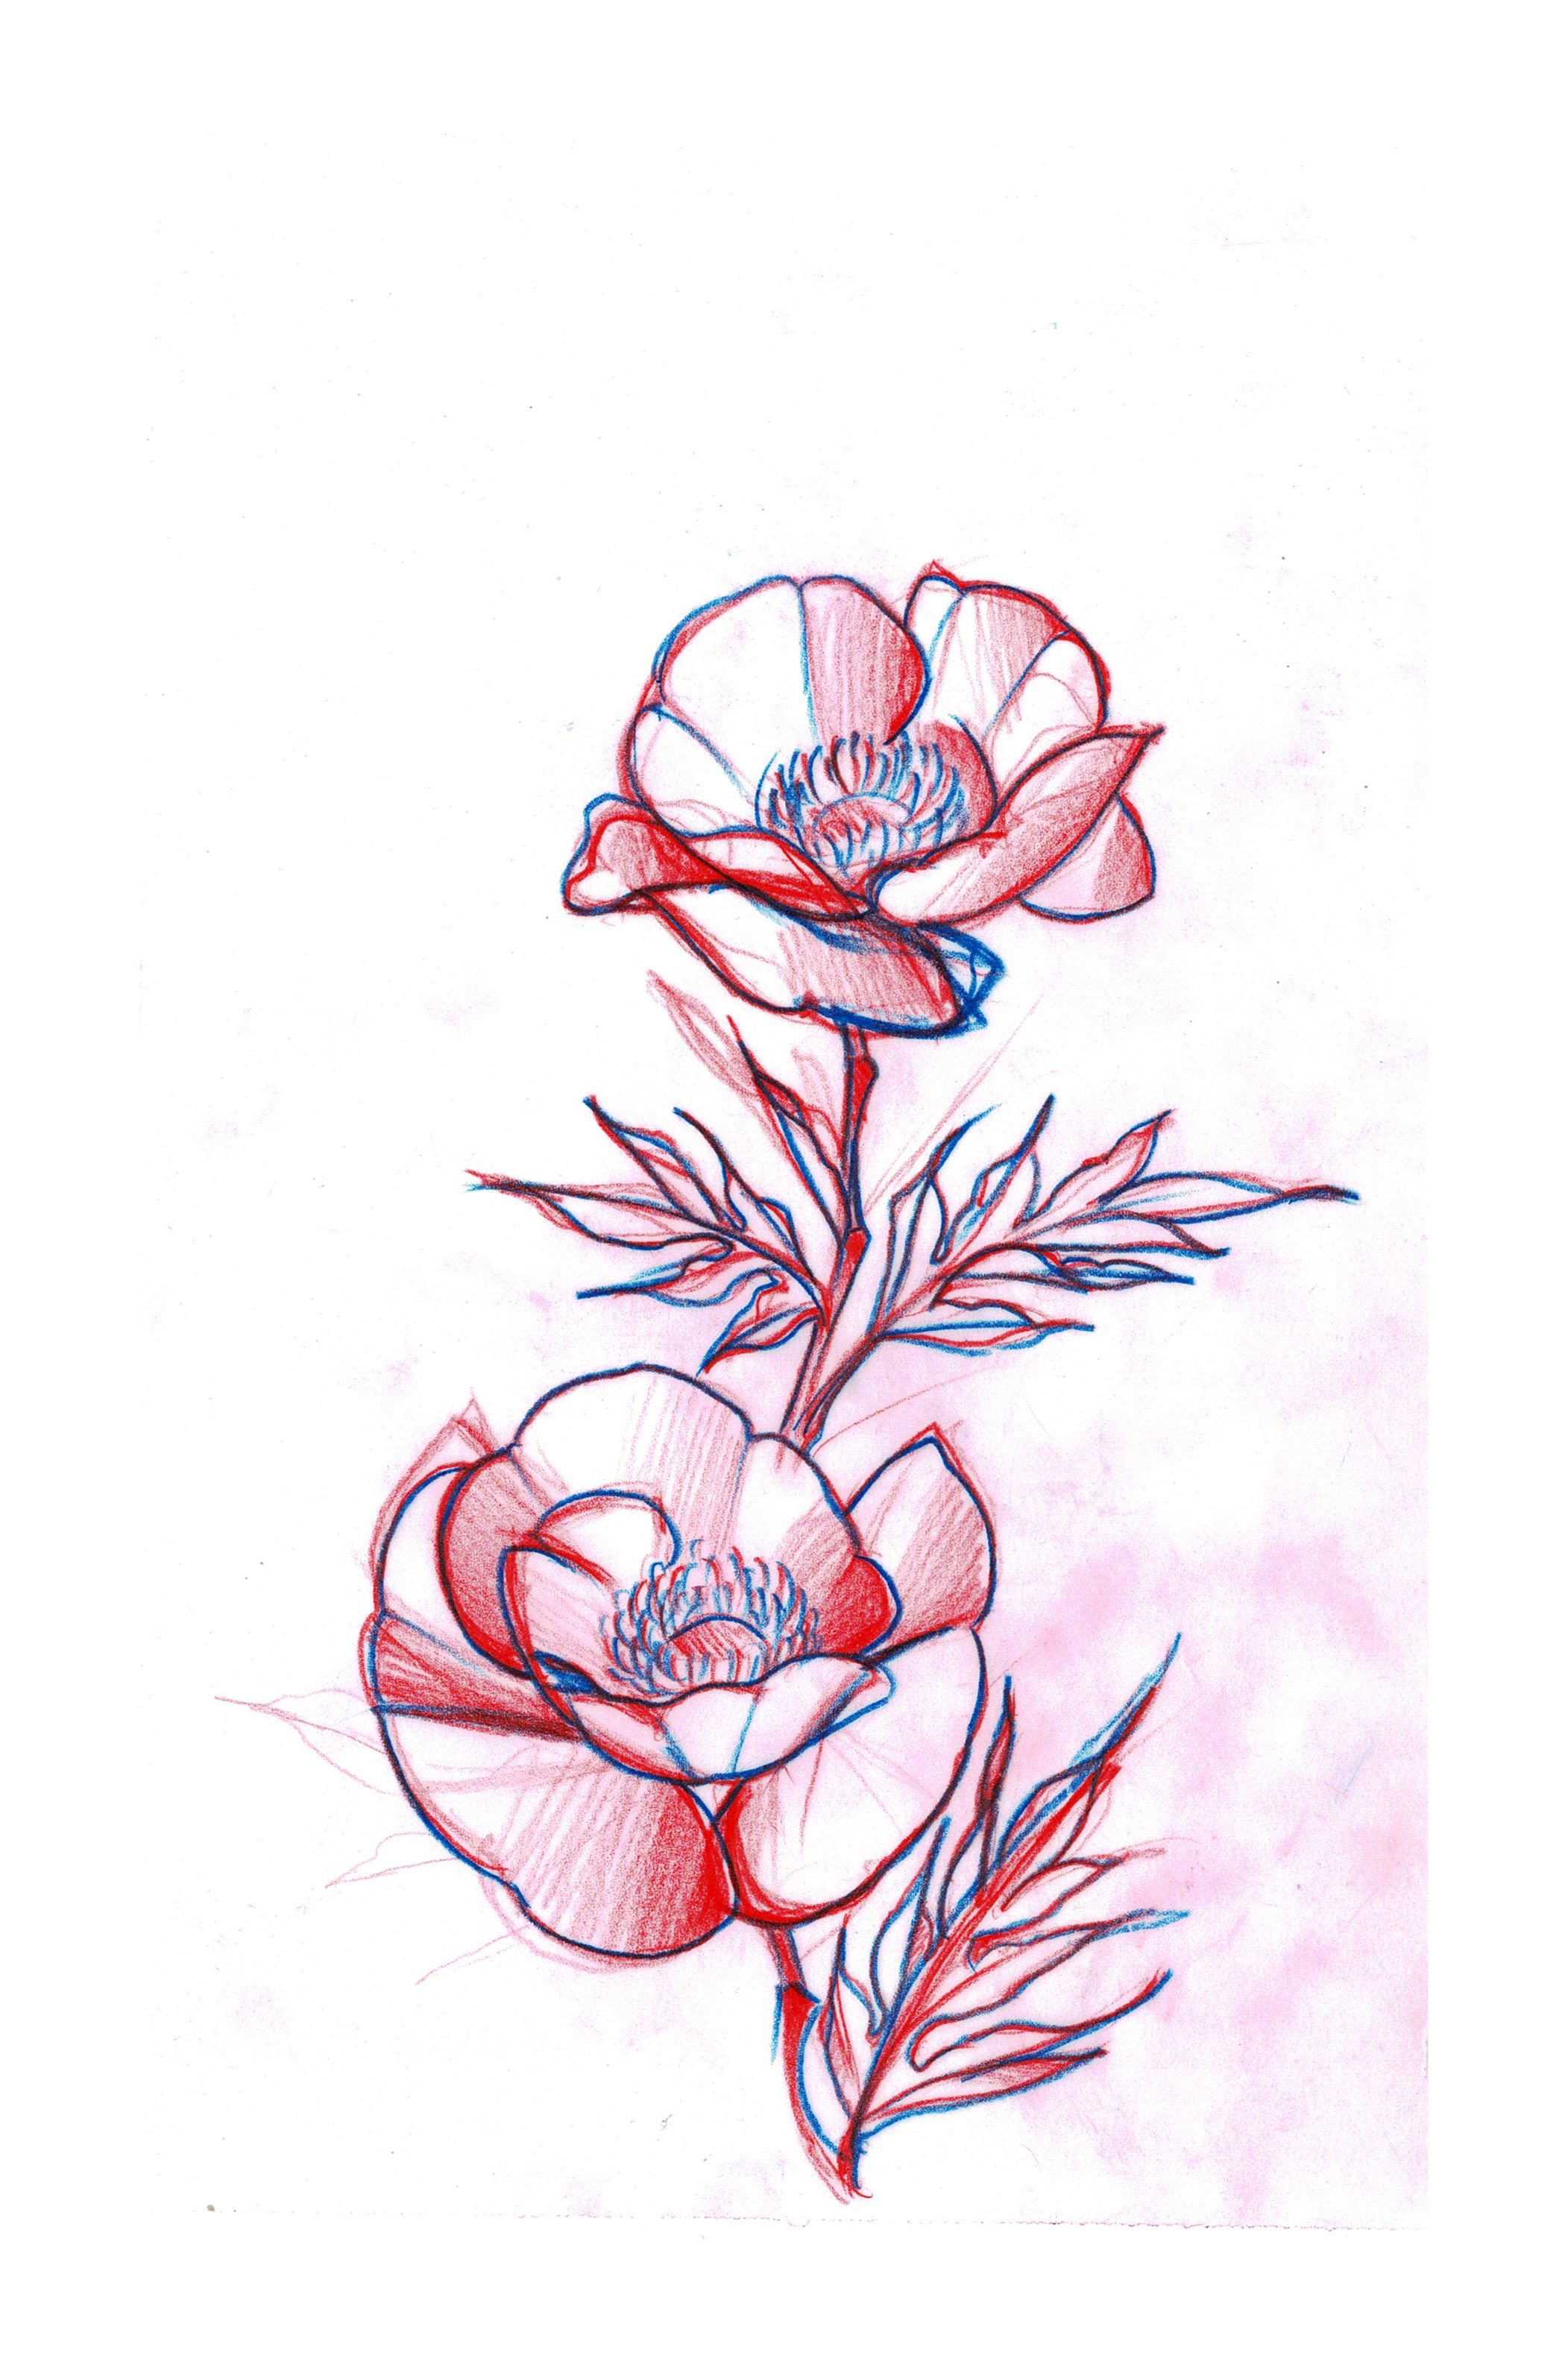 Poppy Flowers Tattoo Sketch Design Sketch Tattoo Design Poppy Flower Poppy Flower Tattoo